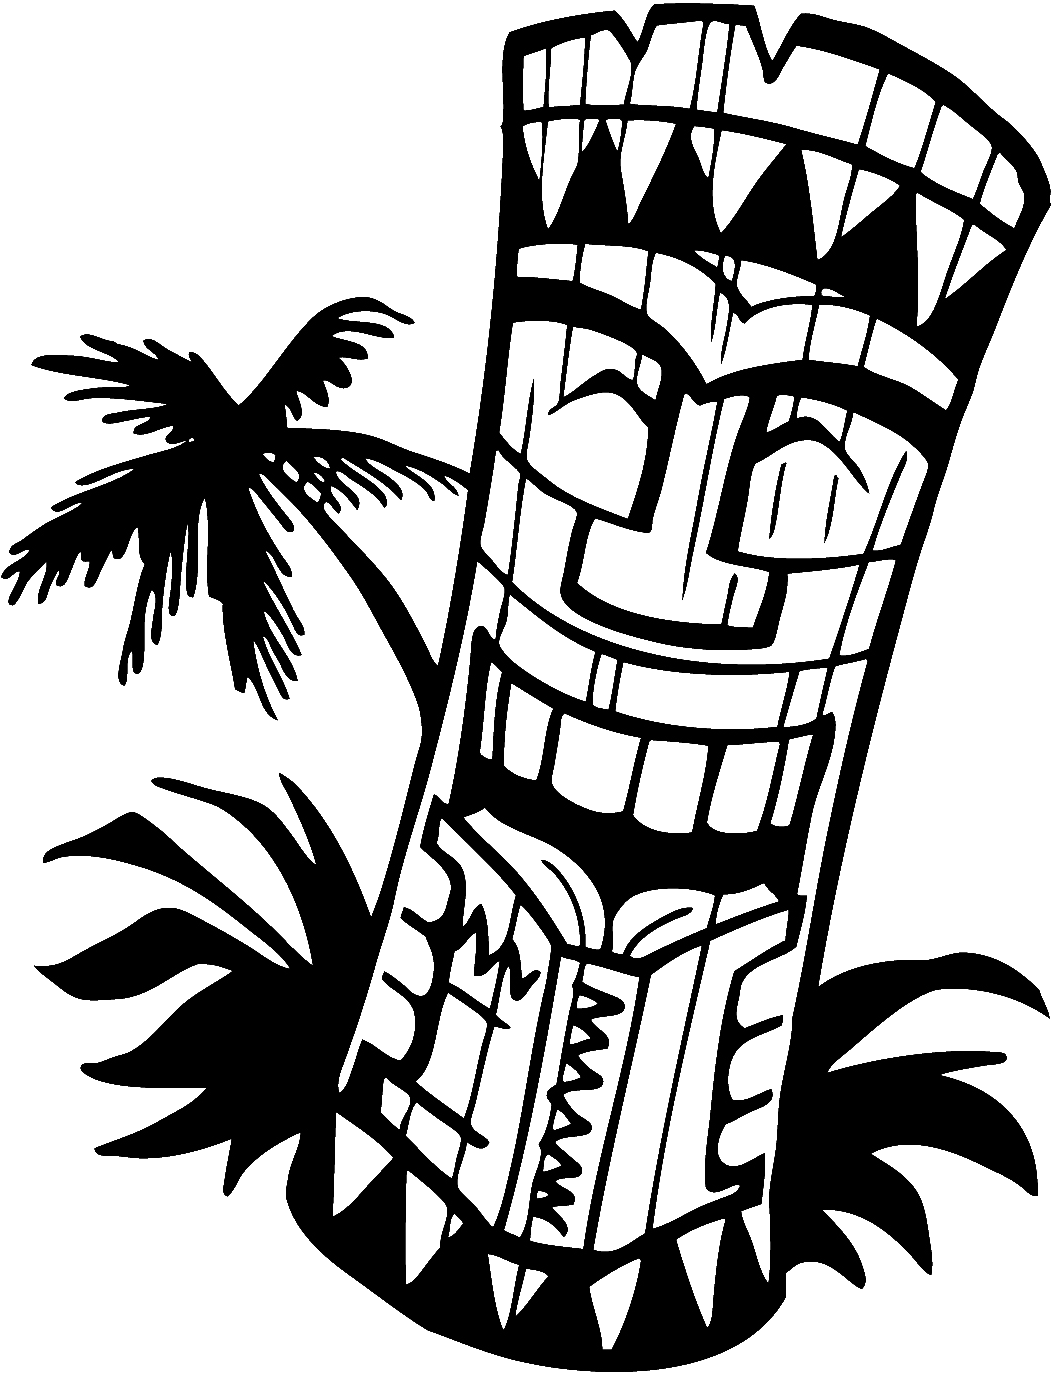 Tiki clipart tiki bar. Happy mask drawings